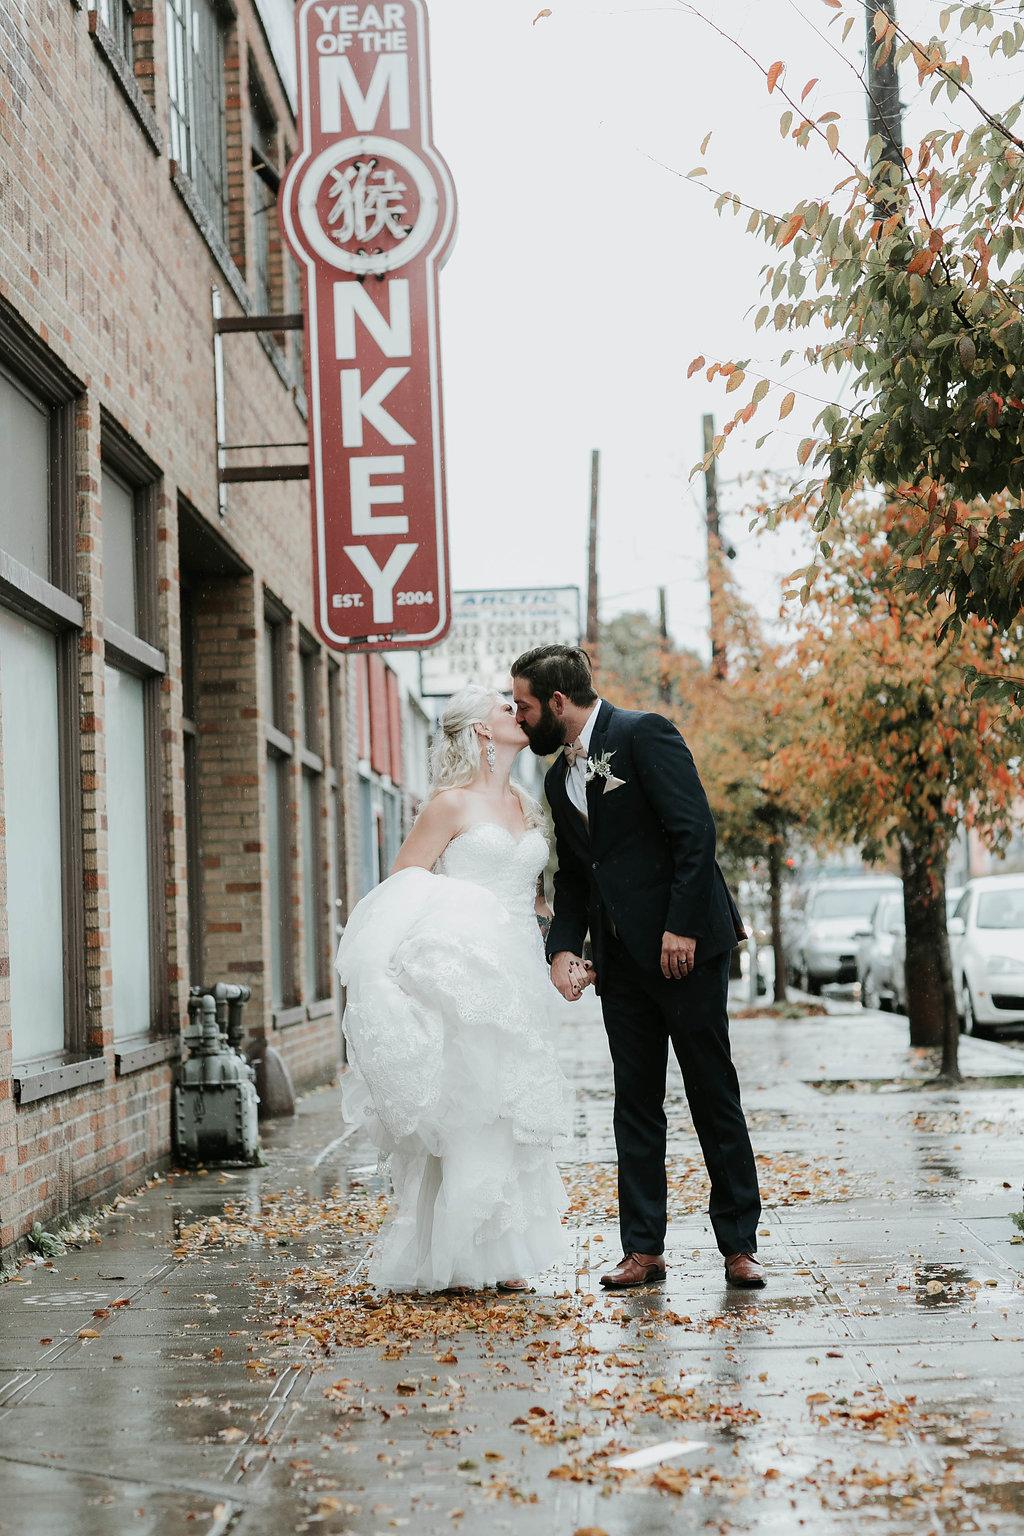 The_Big_Fake_wedding_Seattle_Within_sodo_wedding_by_Adina_Preston_Weddings_115.JPG